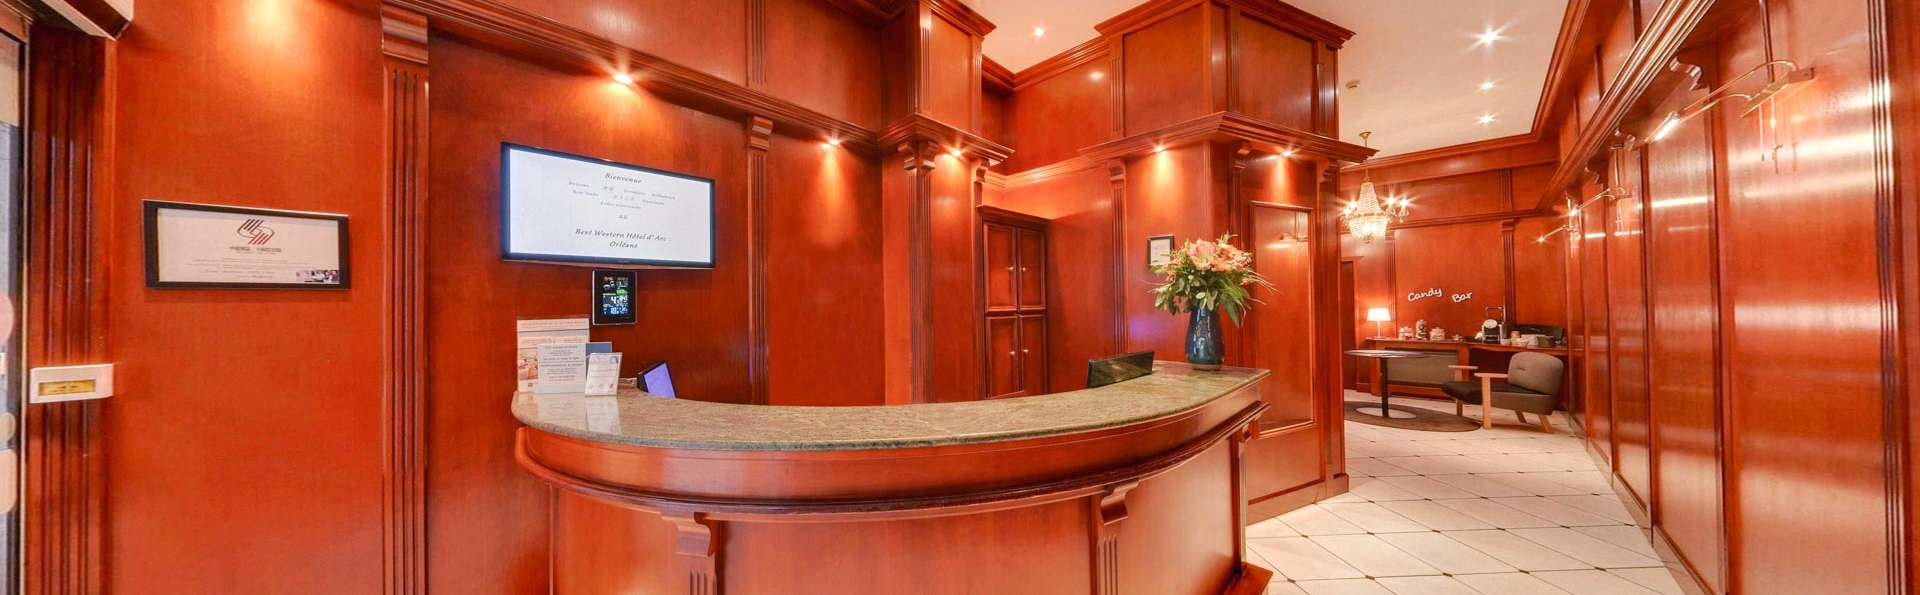 Best Western Hotel d'Arc - EDIT_NEW_LOBBY_01.jpg